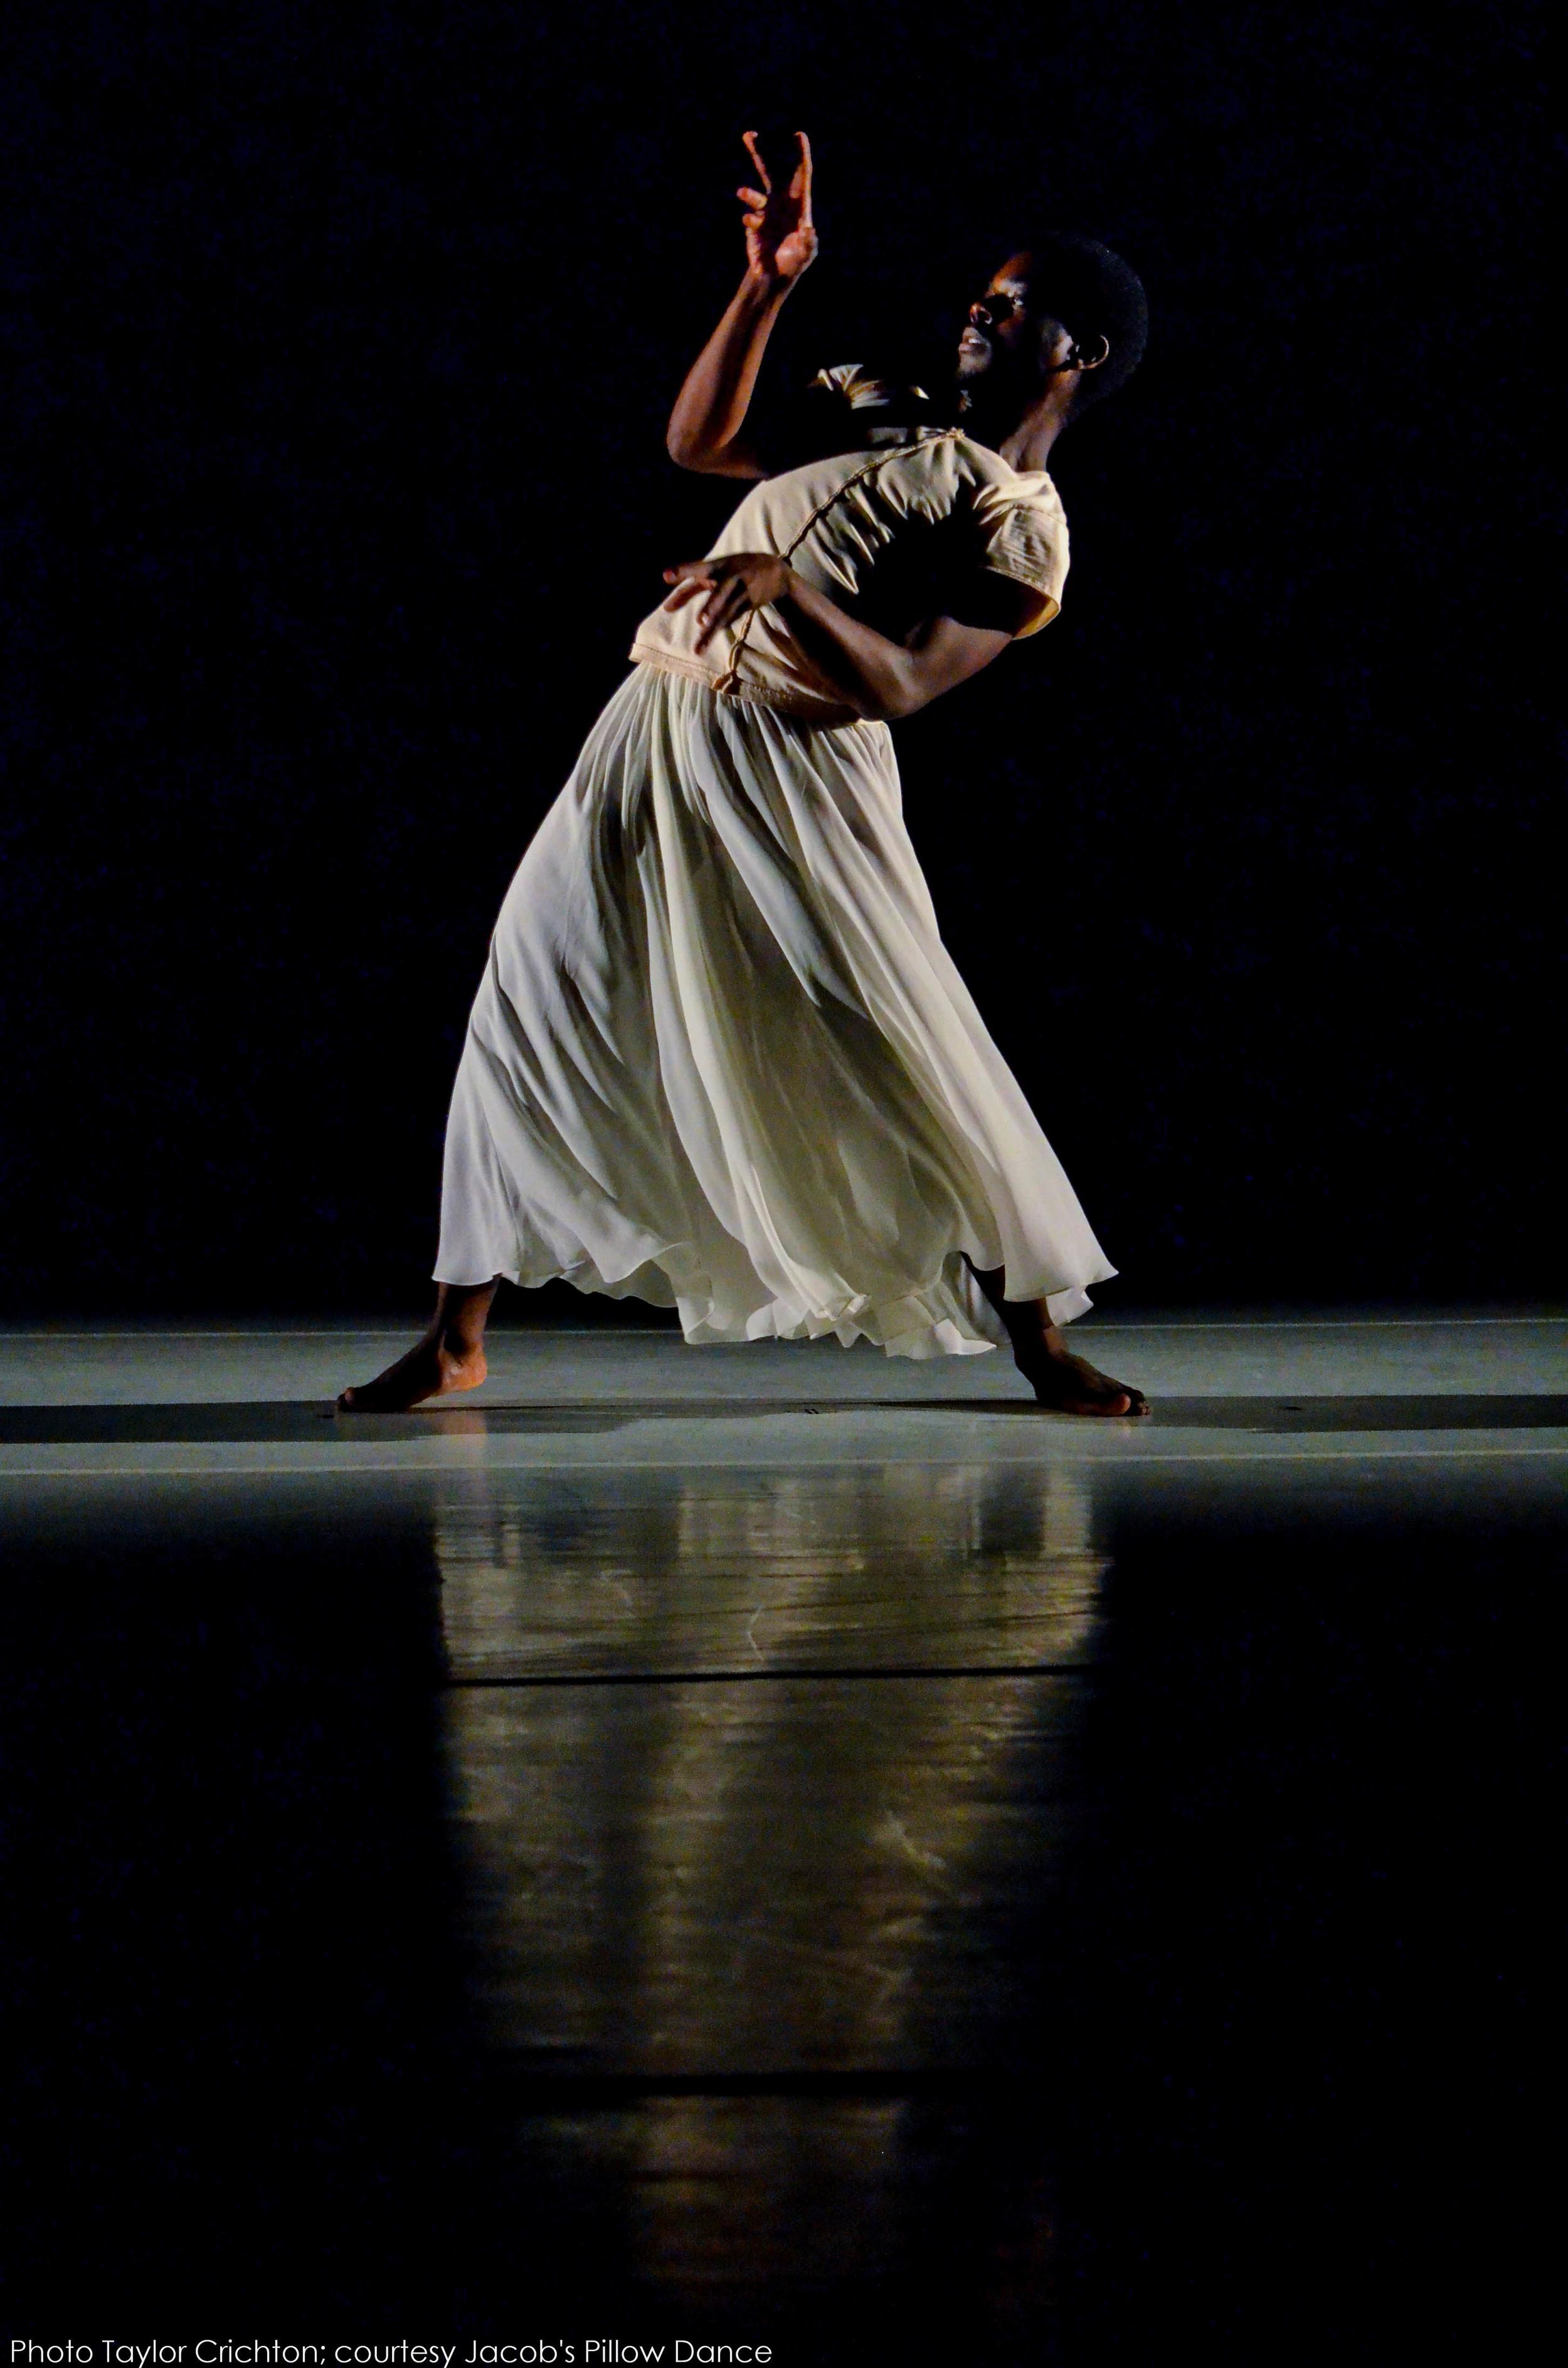 DanceHeginbotham_DressRehearsal_2012TaylorCrichton_007.jpg